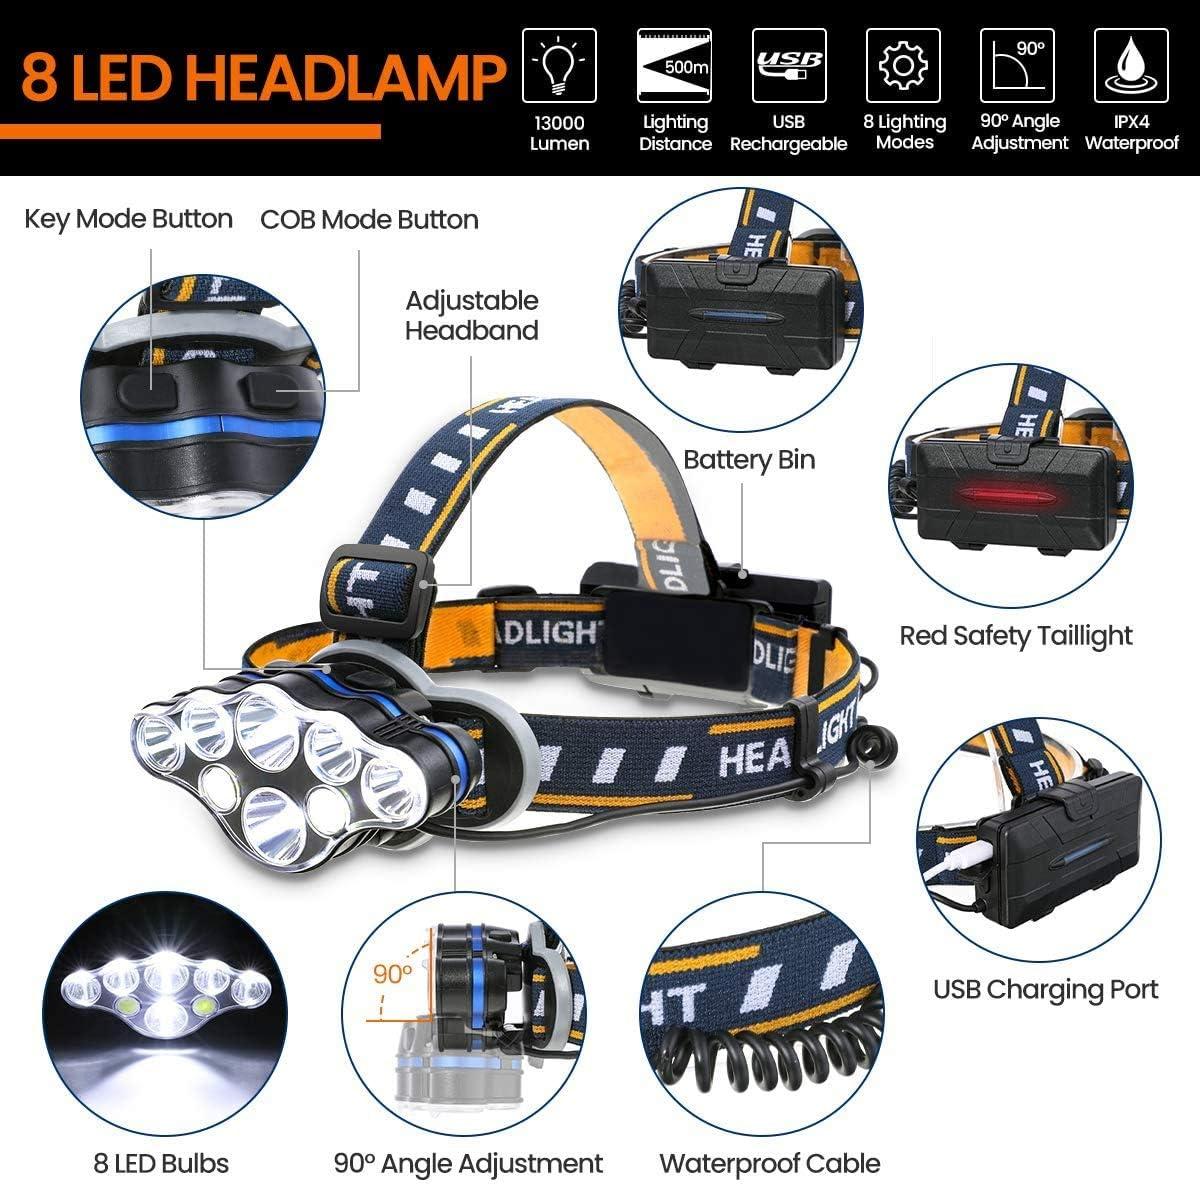 13000 l/úmenes leer superbrillantes /ángulo de 90 grados ajustable LED 8 modos de faro impermeable perfecto para correr 7 faros LED linterna recargable caminar acampar